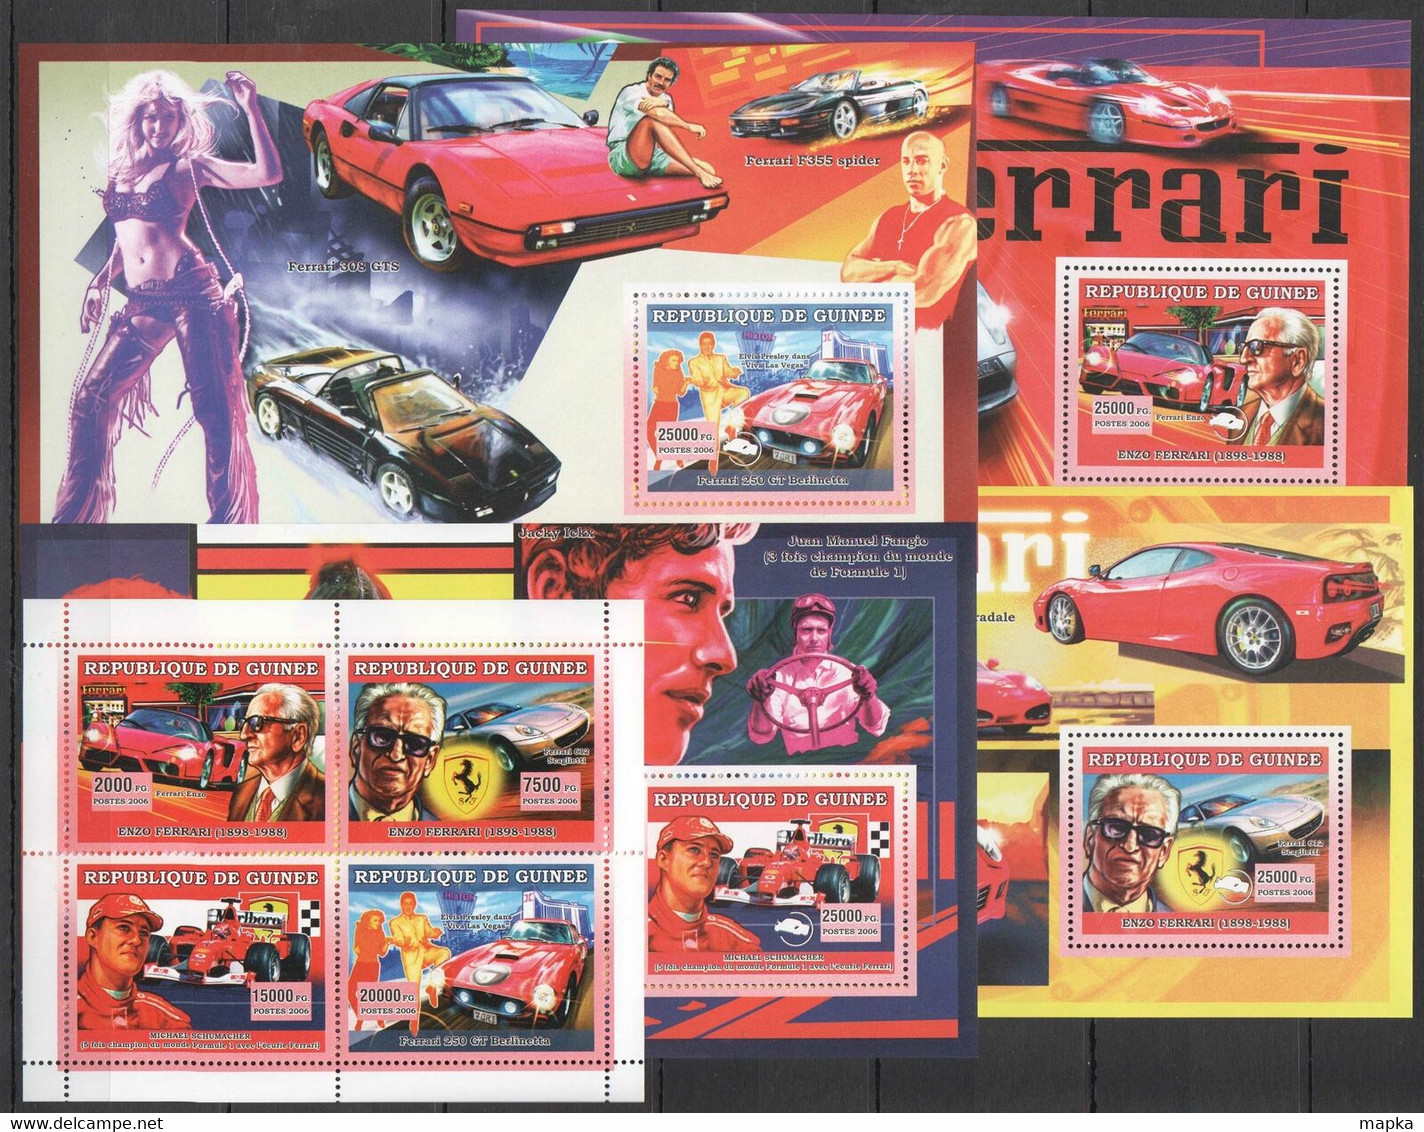 BC1399 2006 GUINEE GUINEA AUTOMOBILES CARS HISTORY FERRARI FORMULA 1 !!! 1KB+4BL MNH - Cars